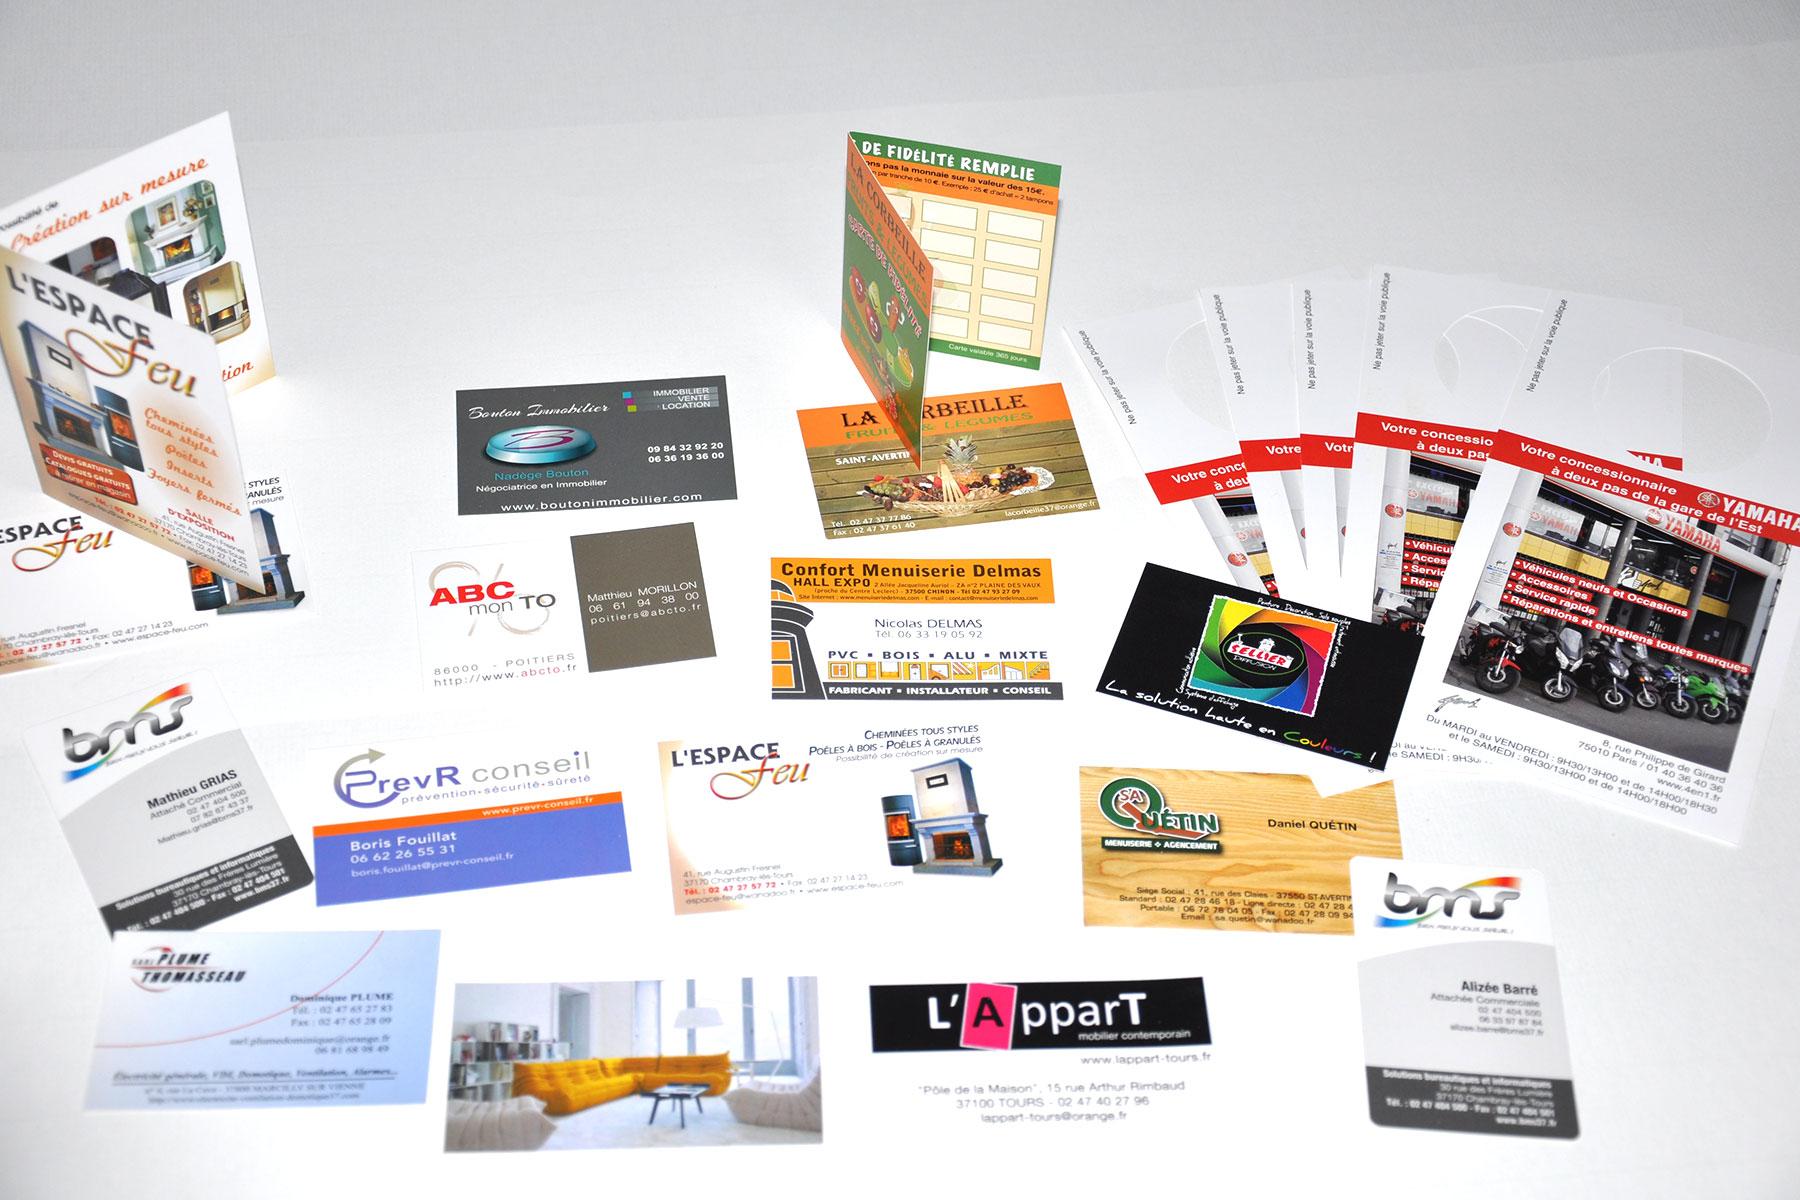 Cartes De Visite Ou Fidelite Imprimee En Express